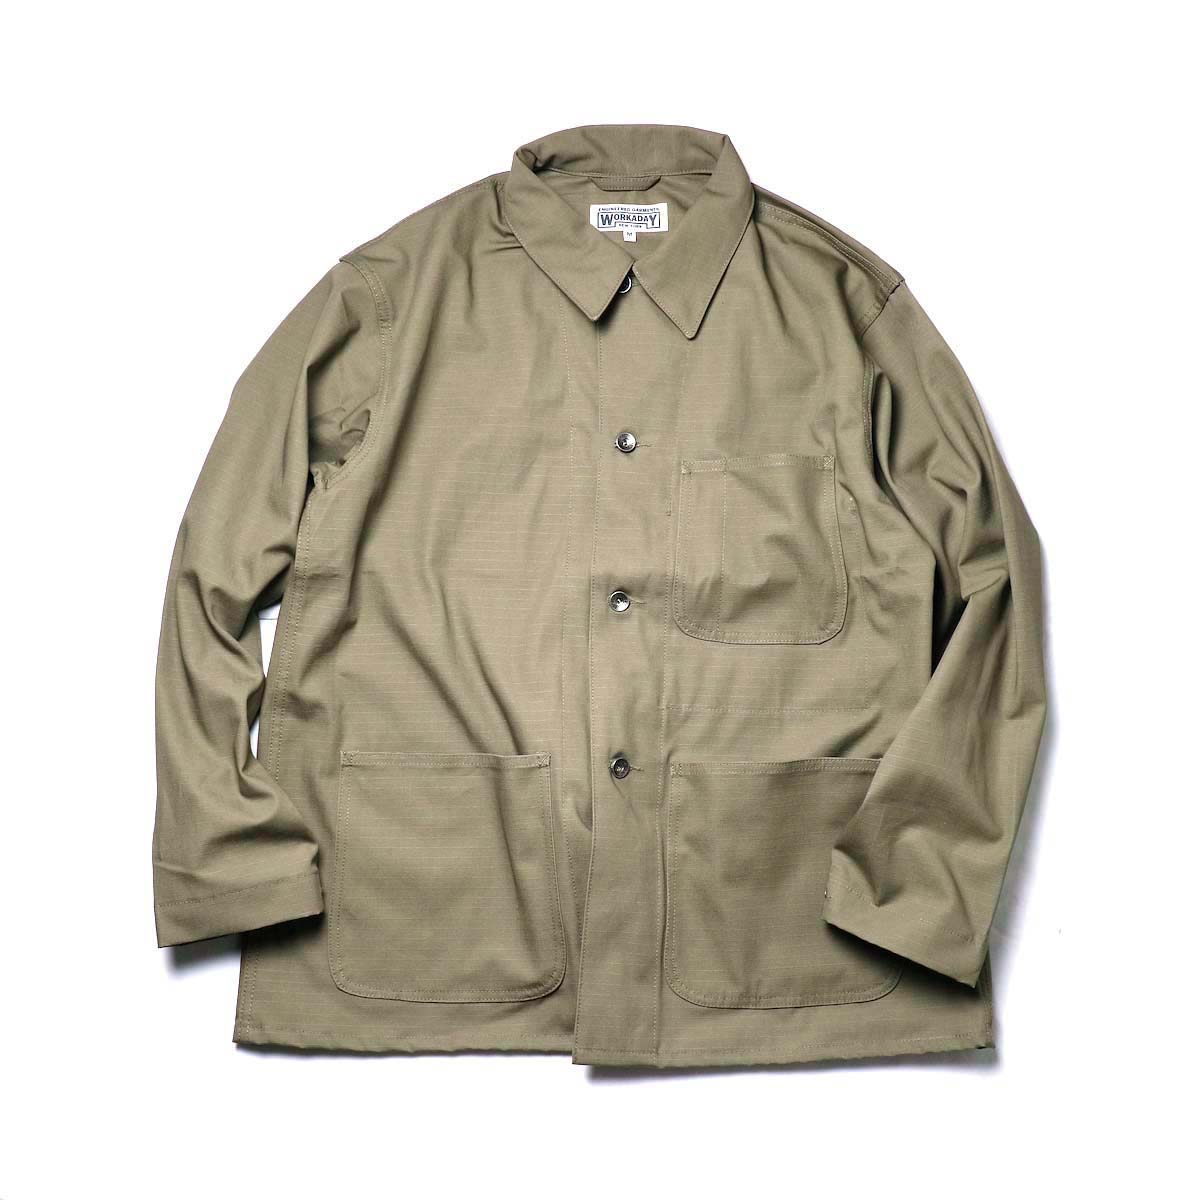 Engineered Garments Workaday / Utility Jacket - Cotton Ripstop (Khaki)正面